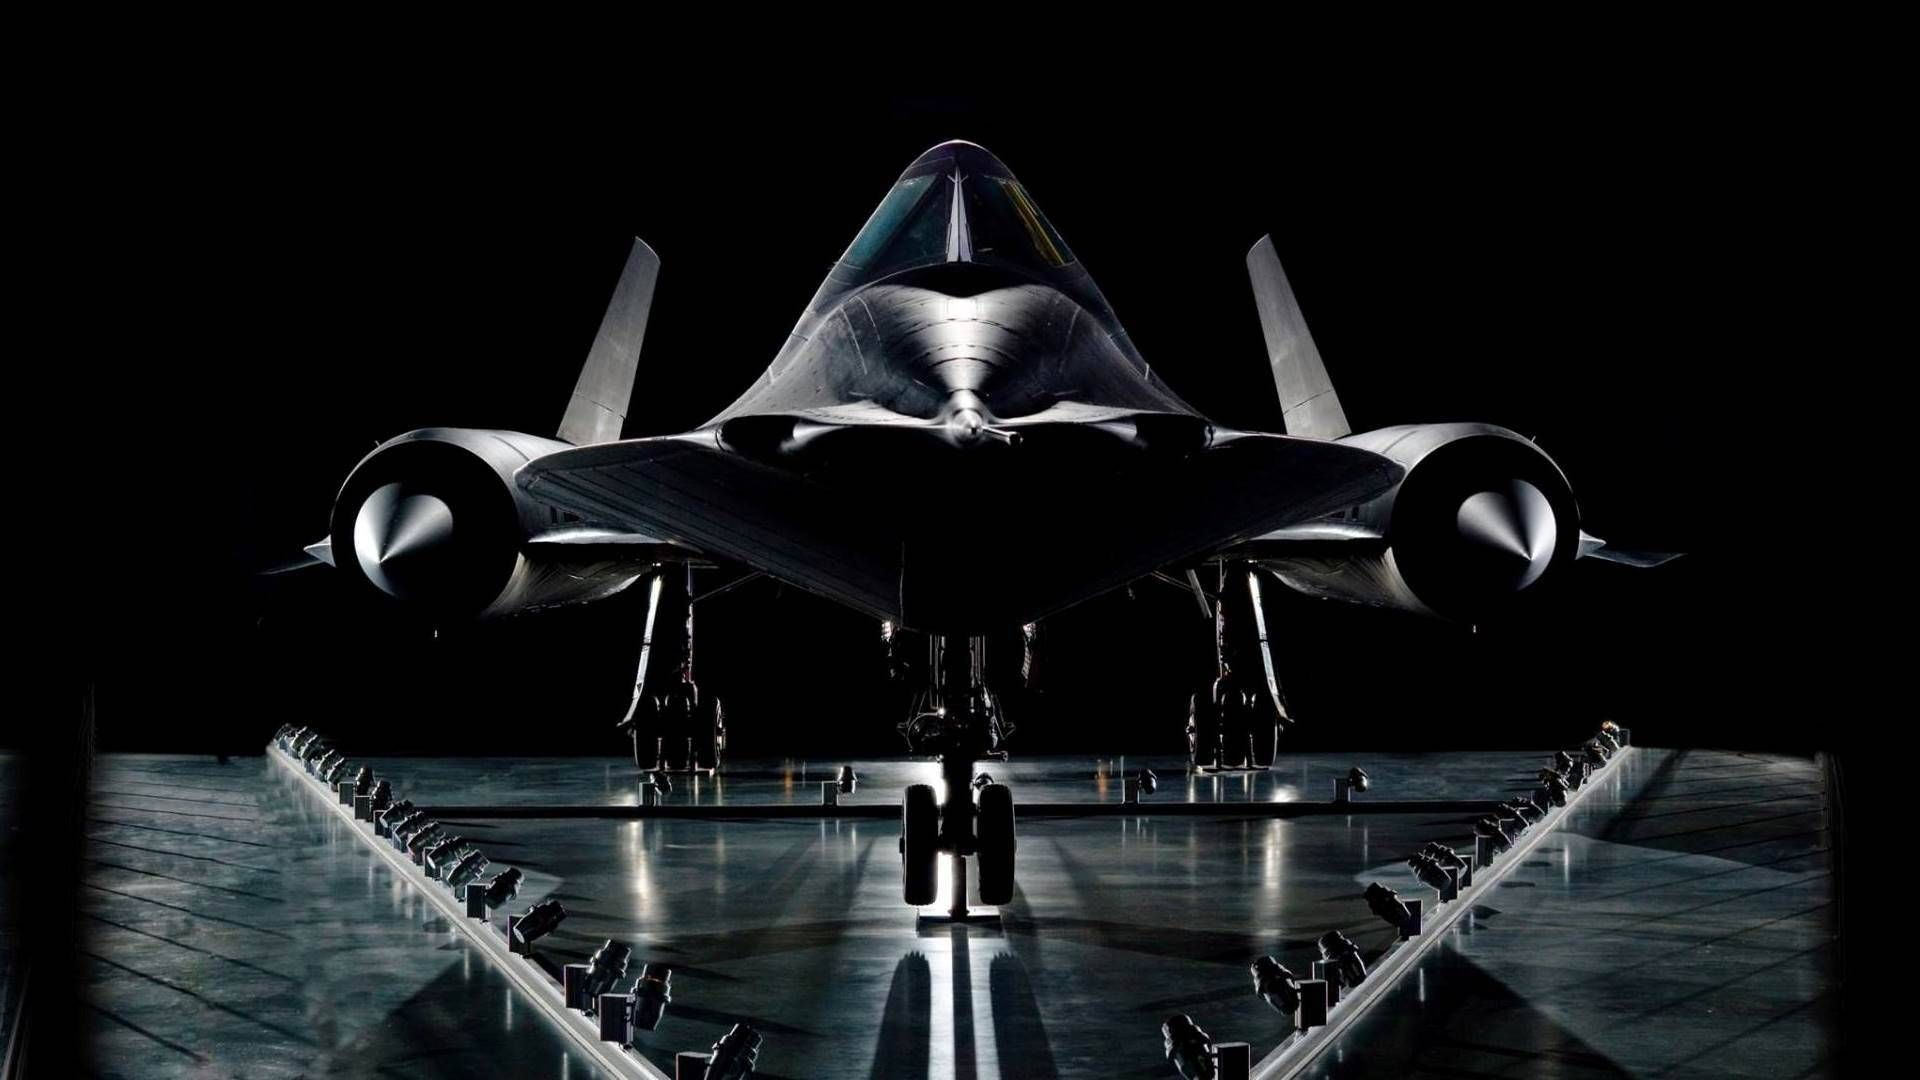 USAF Lockheed SR71 Blackbird is the world's fastest jet